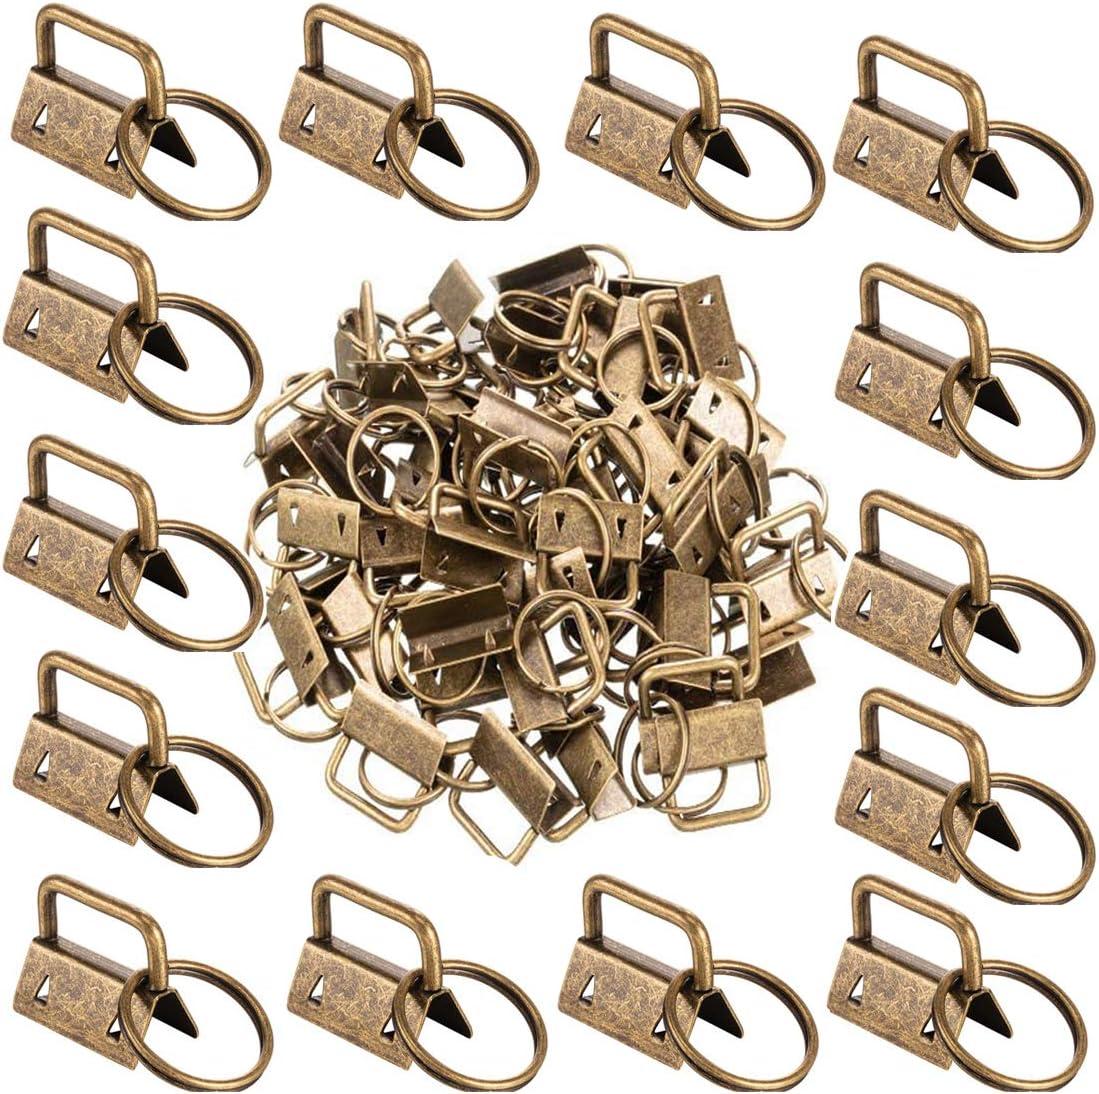 50Pcs 1 Inch Key Fob Hardware Bronze Key Chain Fob Wristlet Hardware with Key Ring for Lanyard